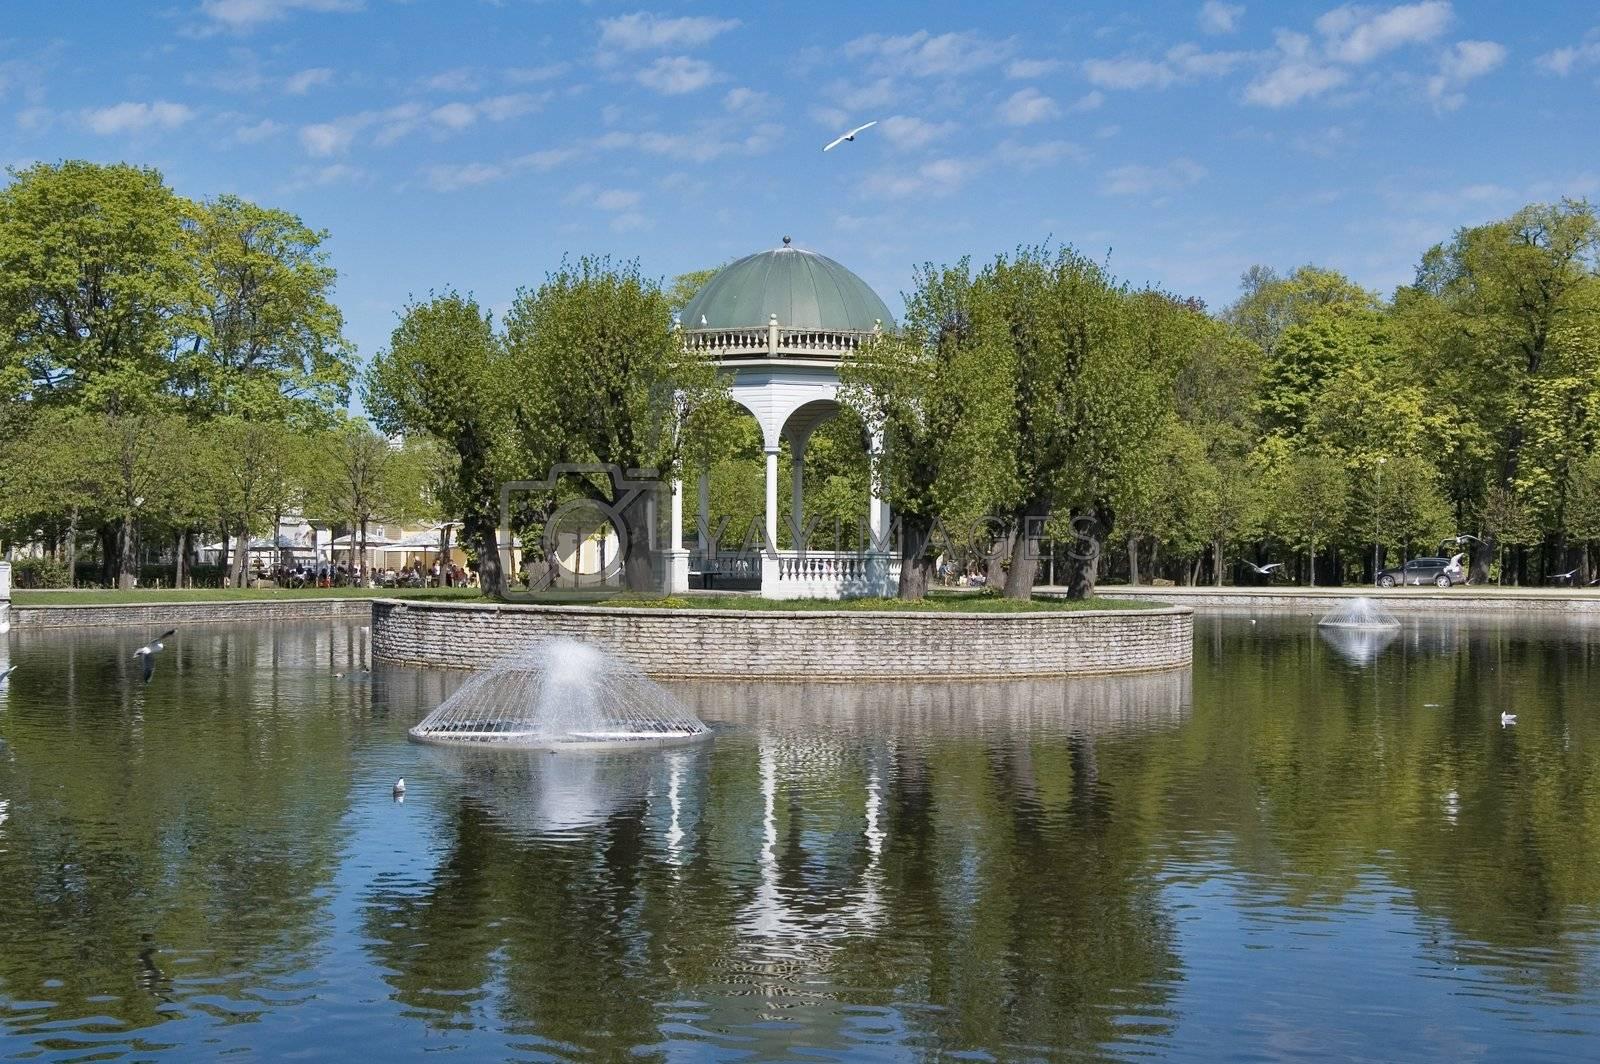 Park Kadriorg in Tallinn